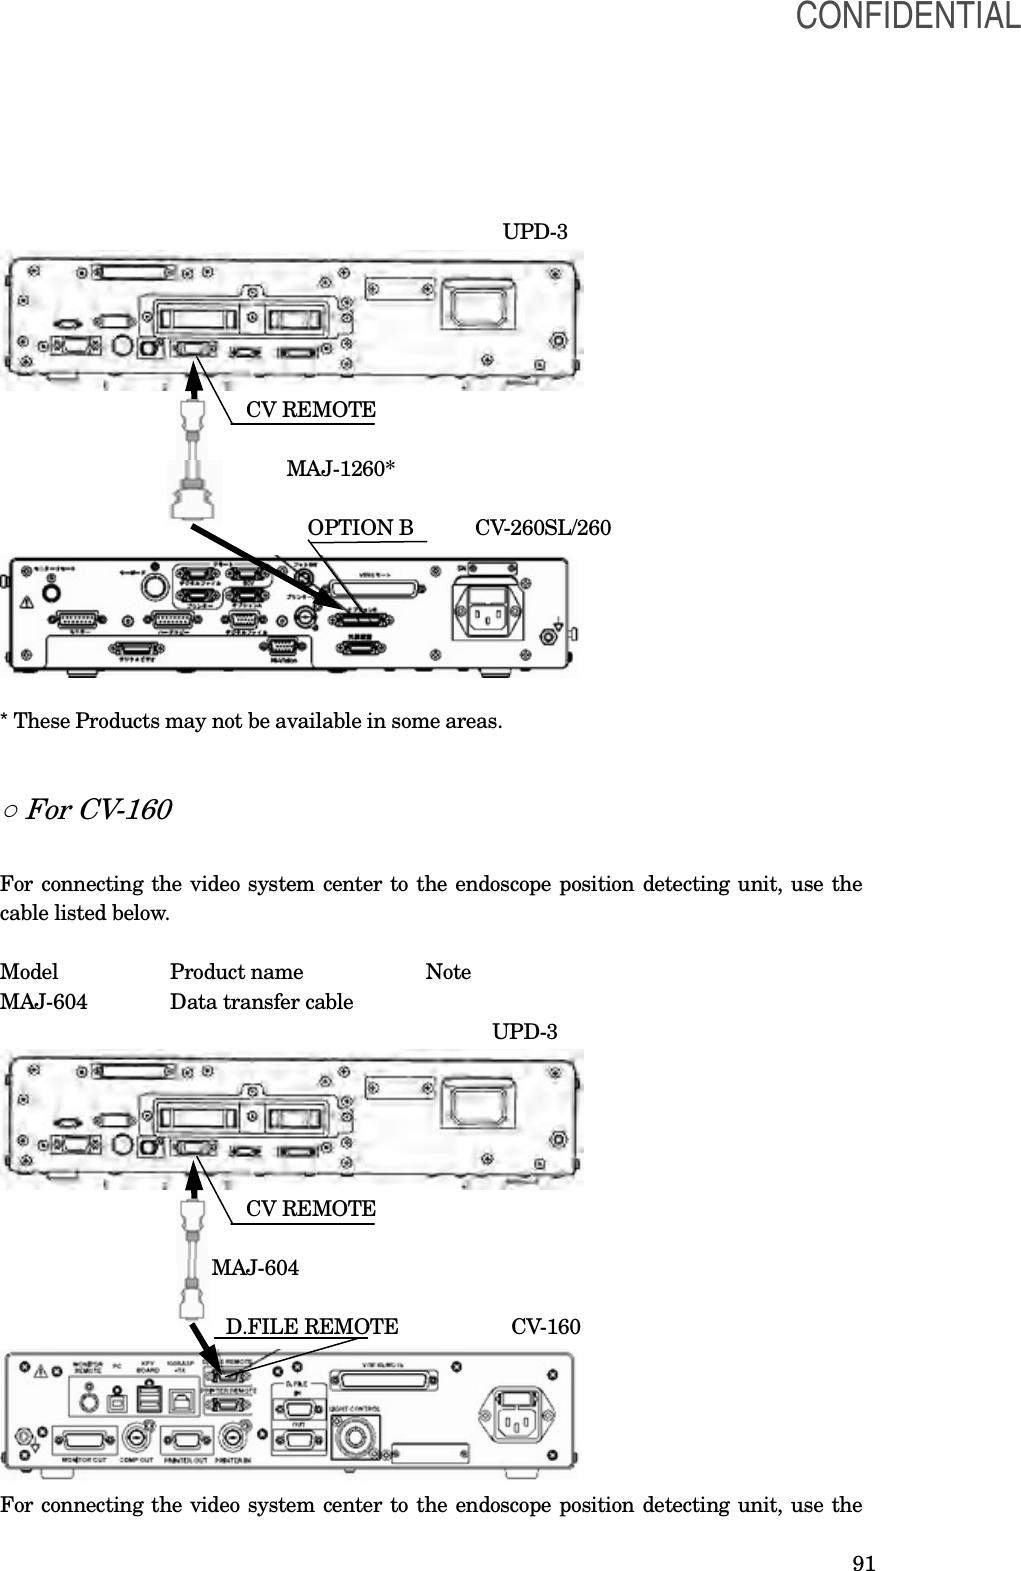 olympus viewer 3 user manual download